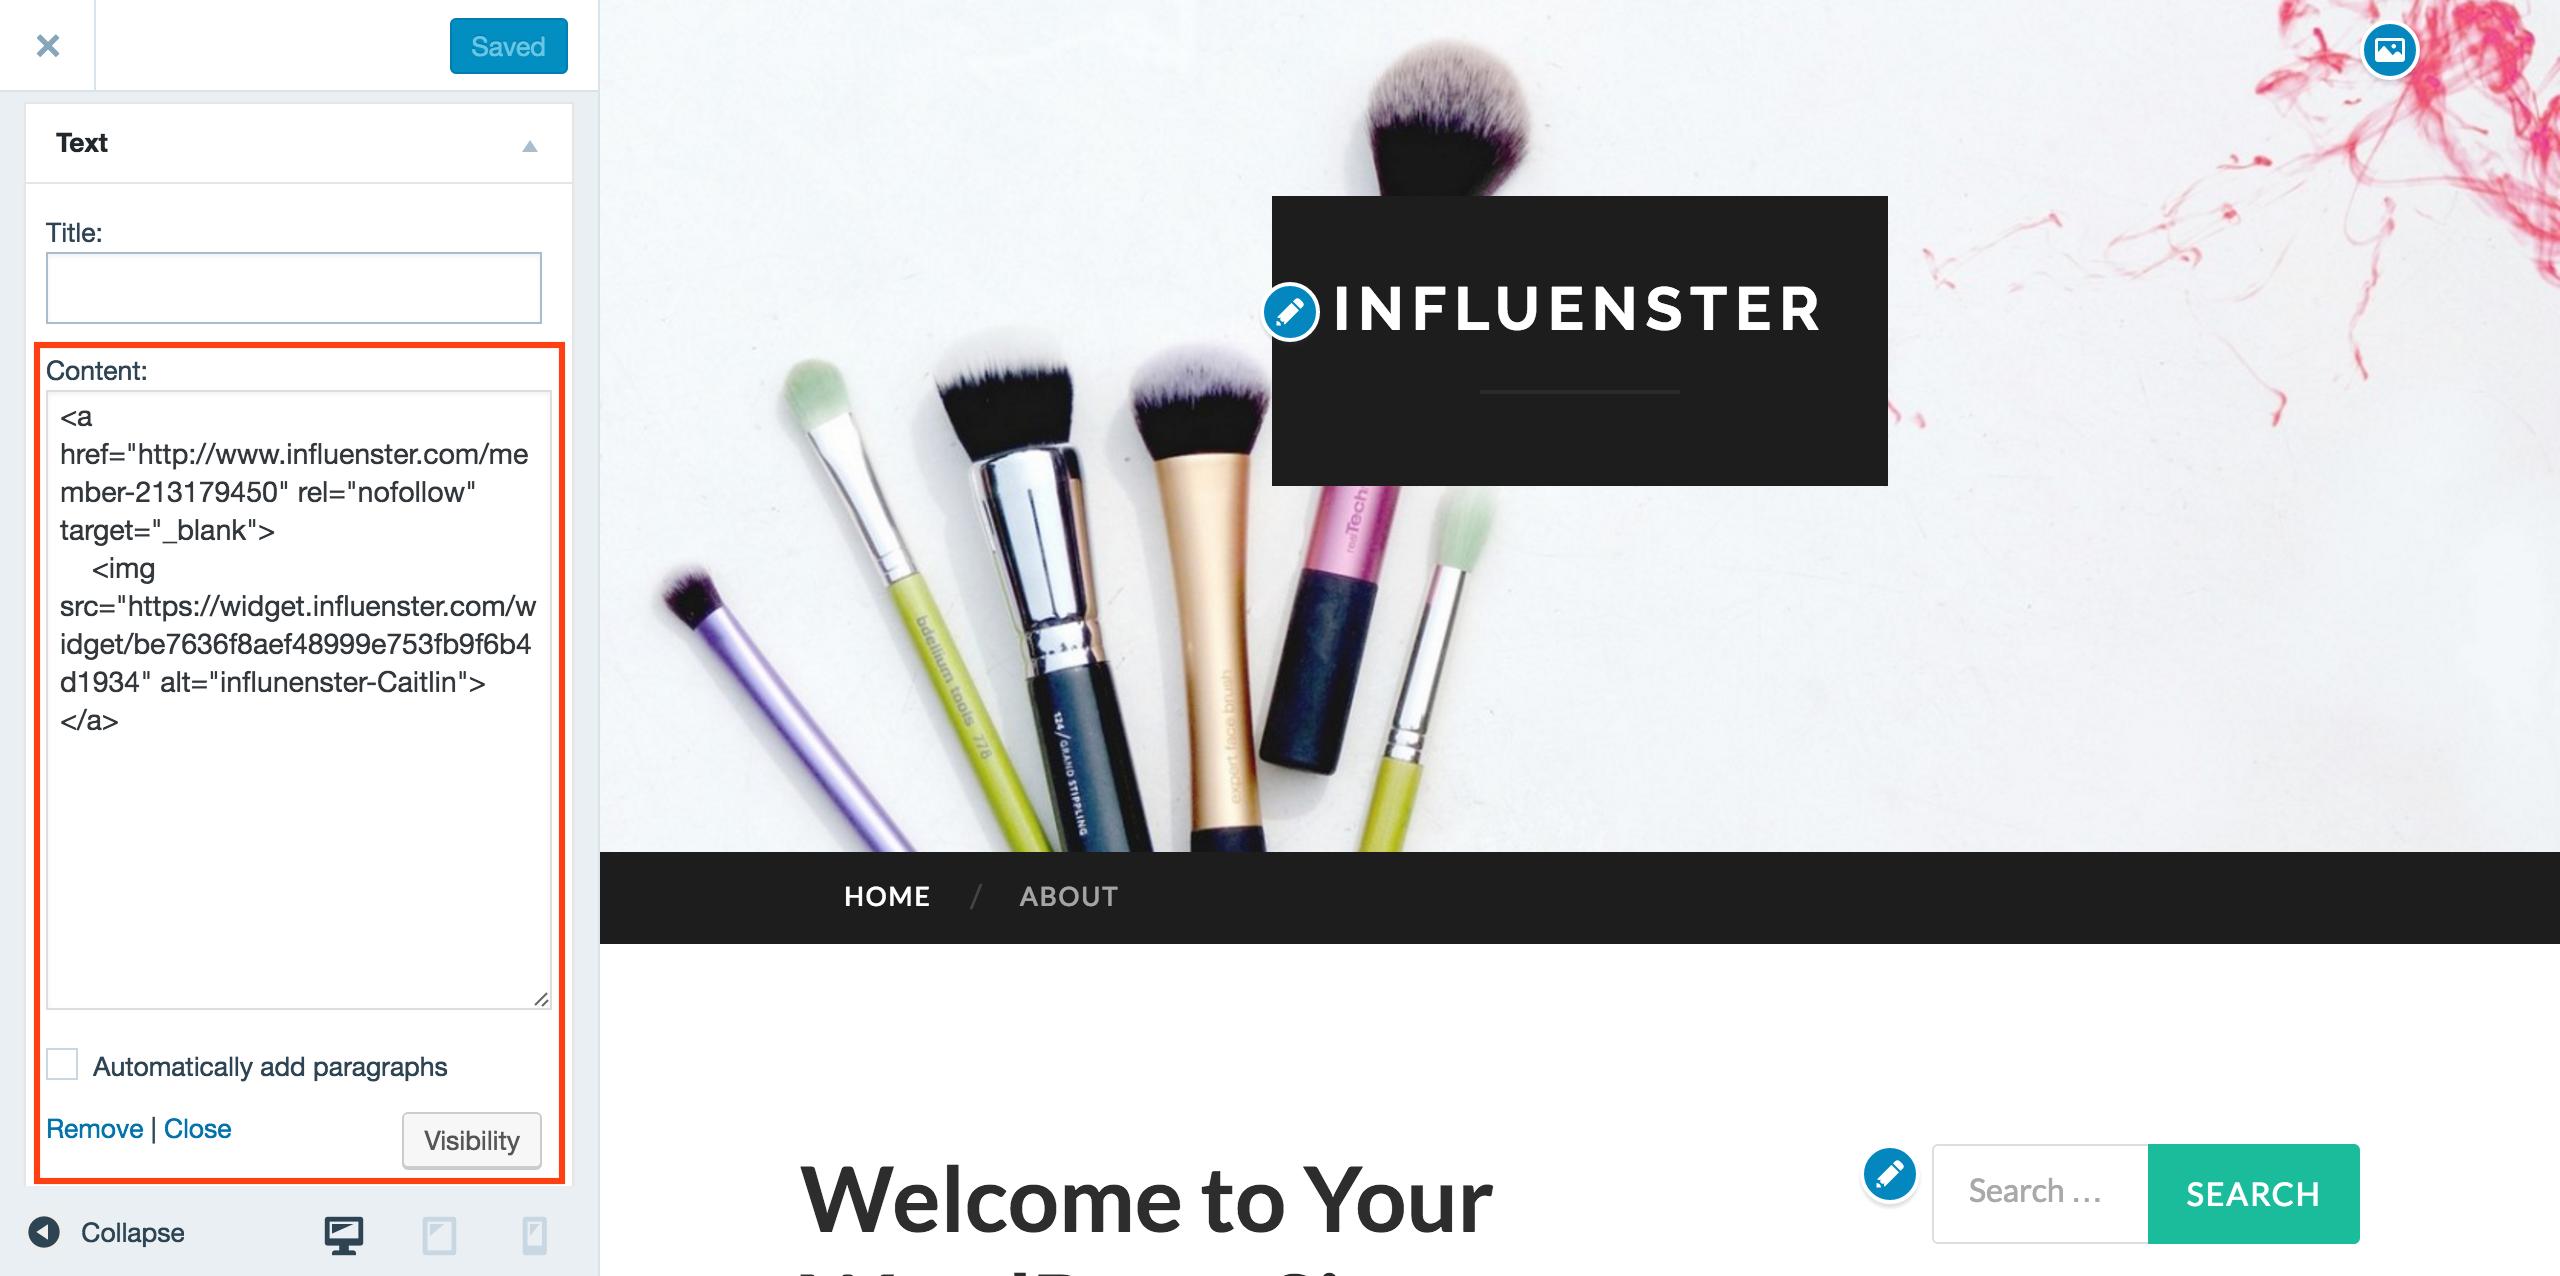 Adding Influenster Blog Widget